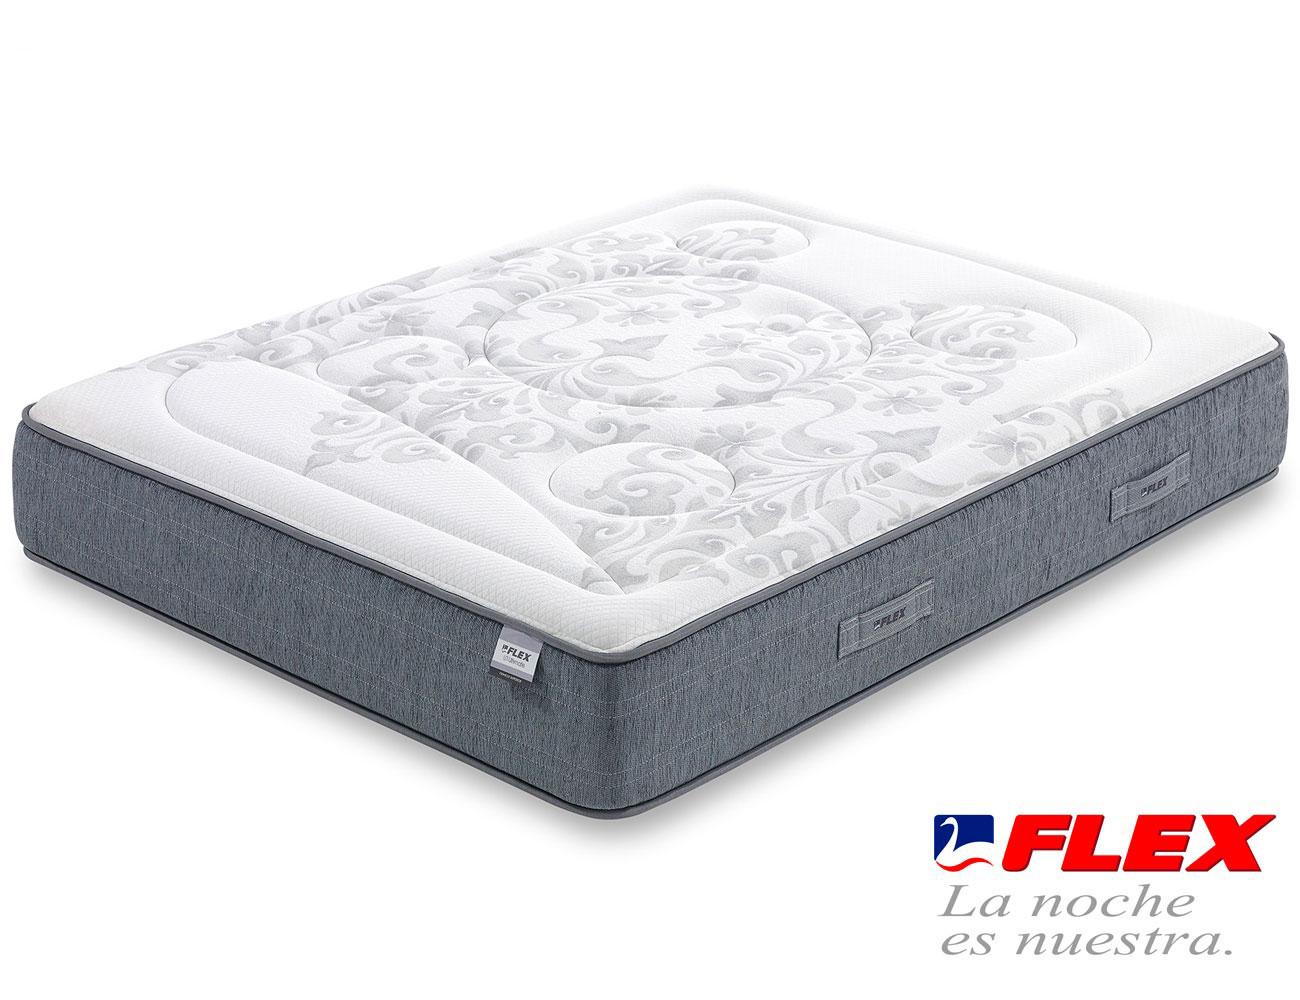 Colchon flex airvex viscoelastica gel garbi superior1